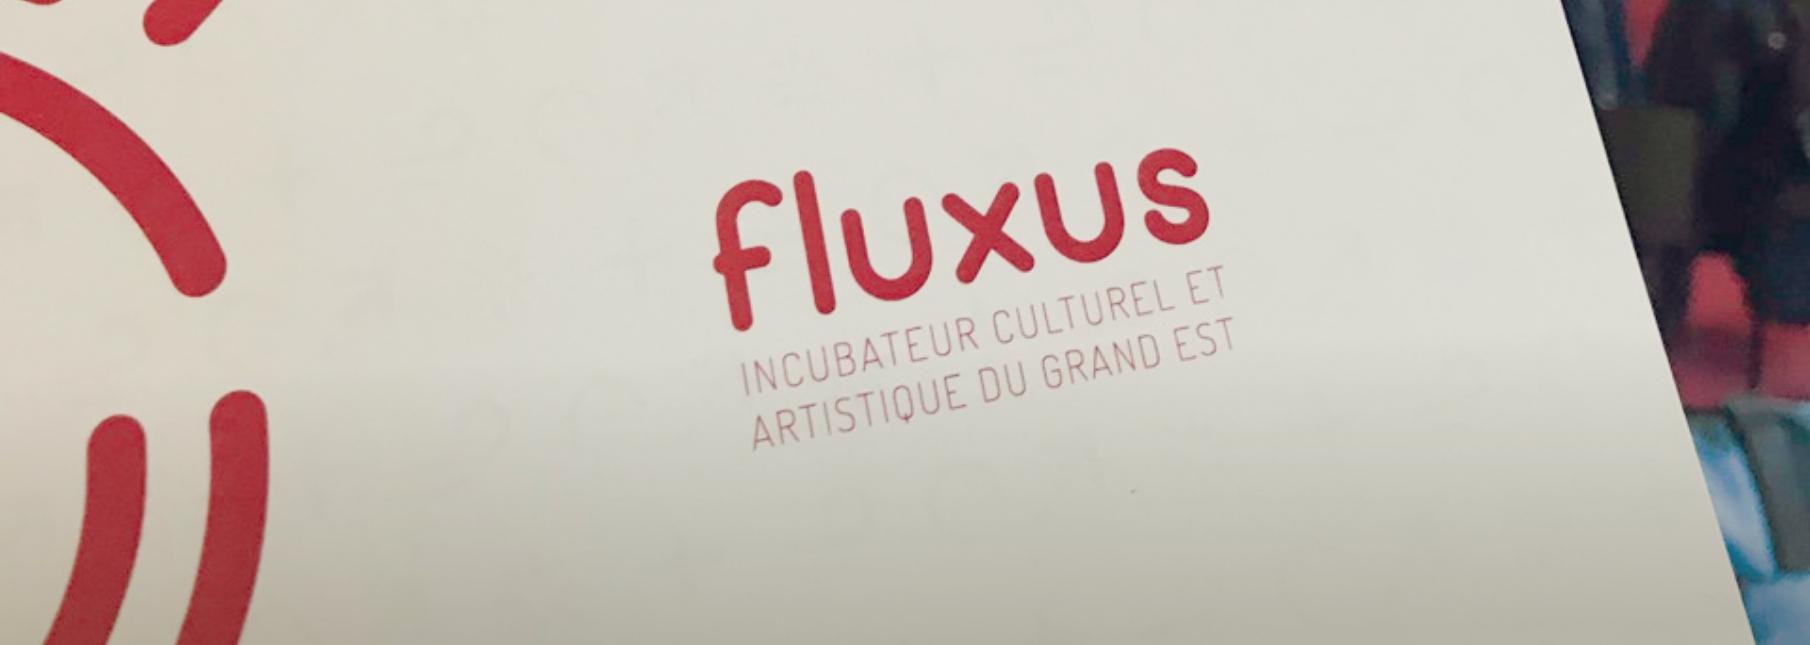 fluxus-incubateur-cest-quoi-header